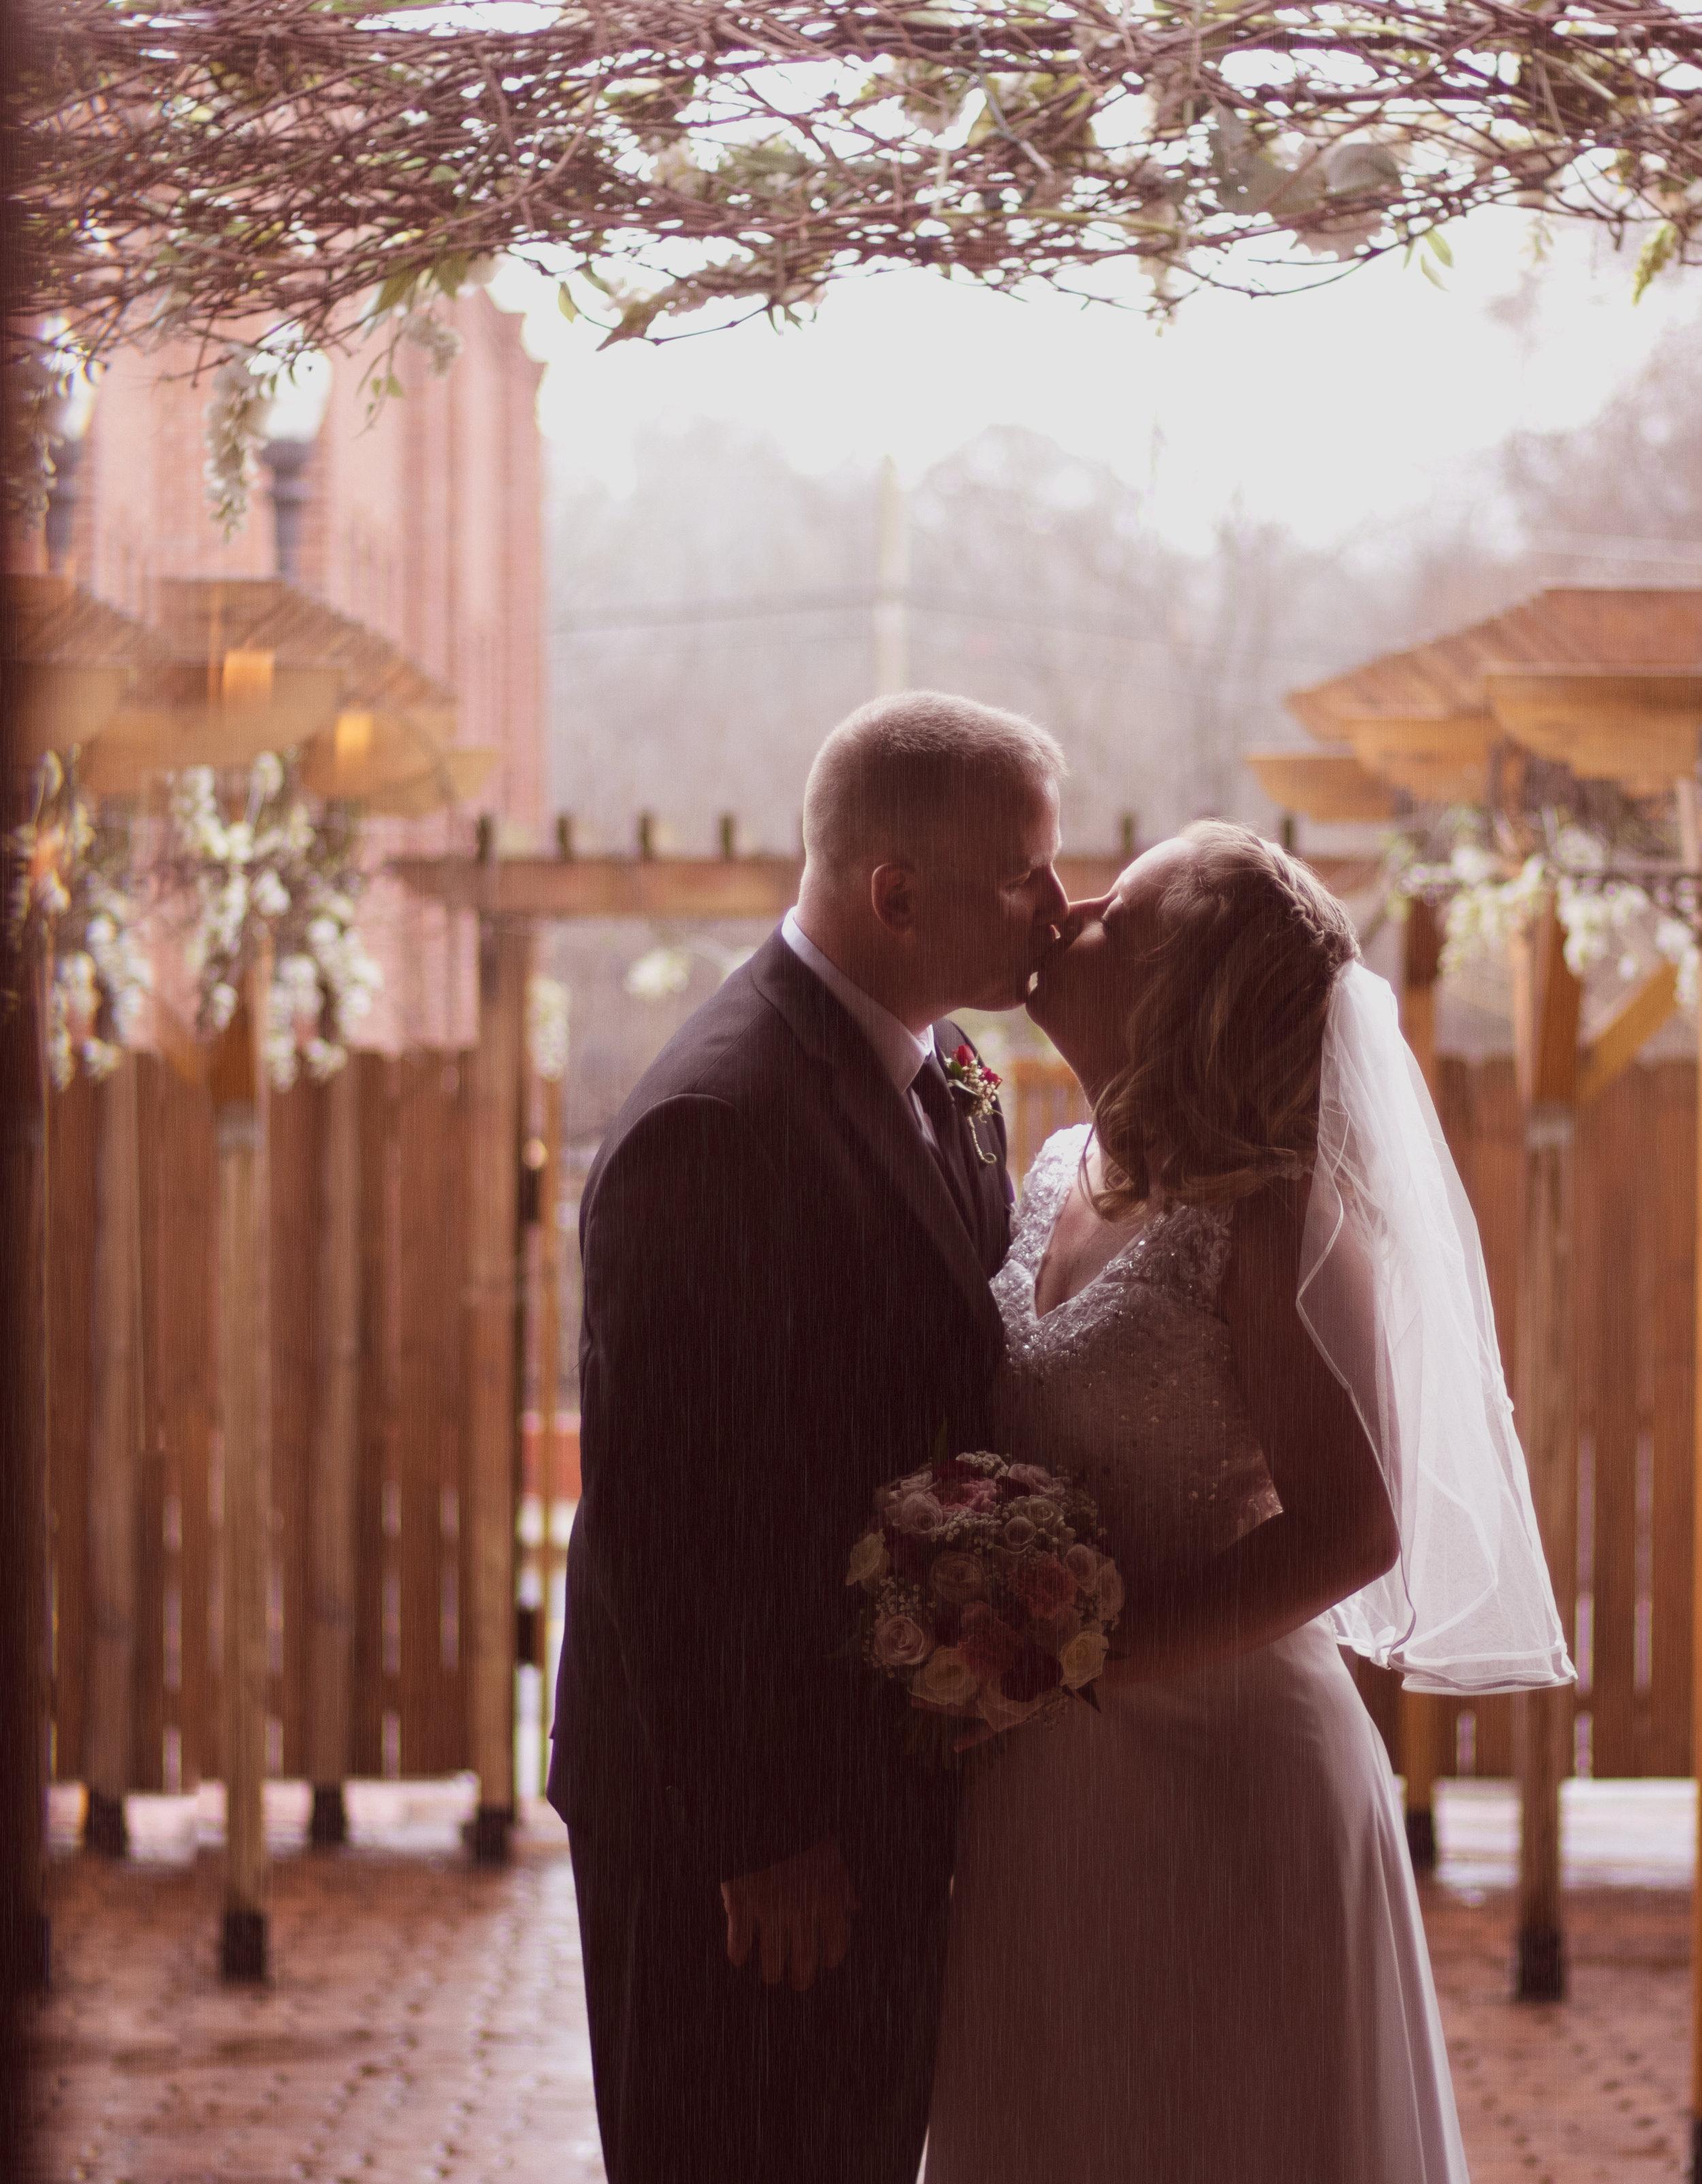 kissing in the rain wedding photography marietta ga woodstock ga north ga atlanta ga rain session street productions